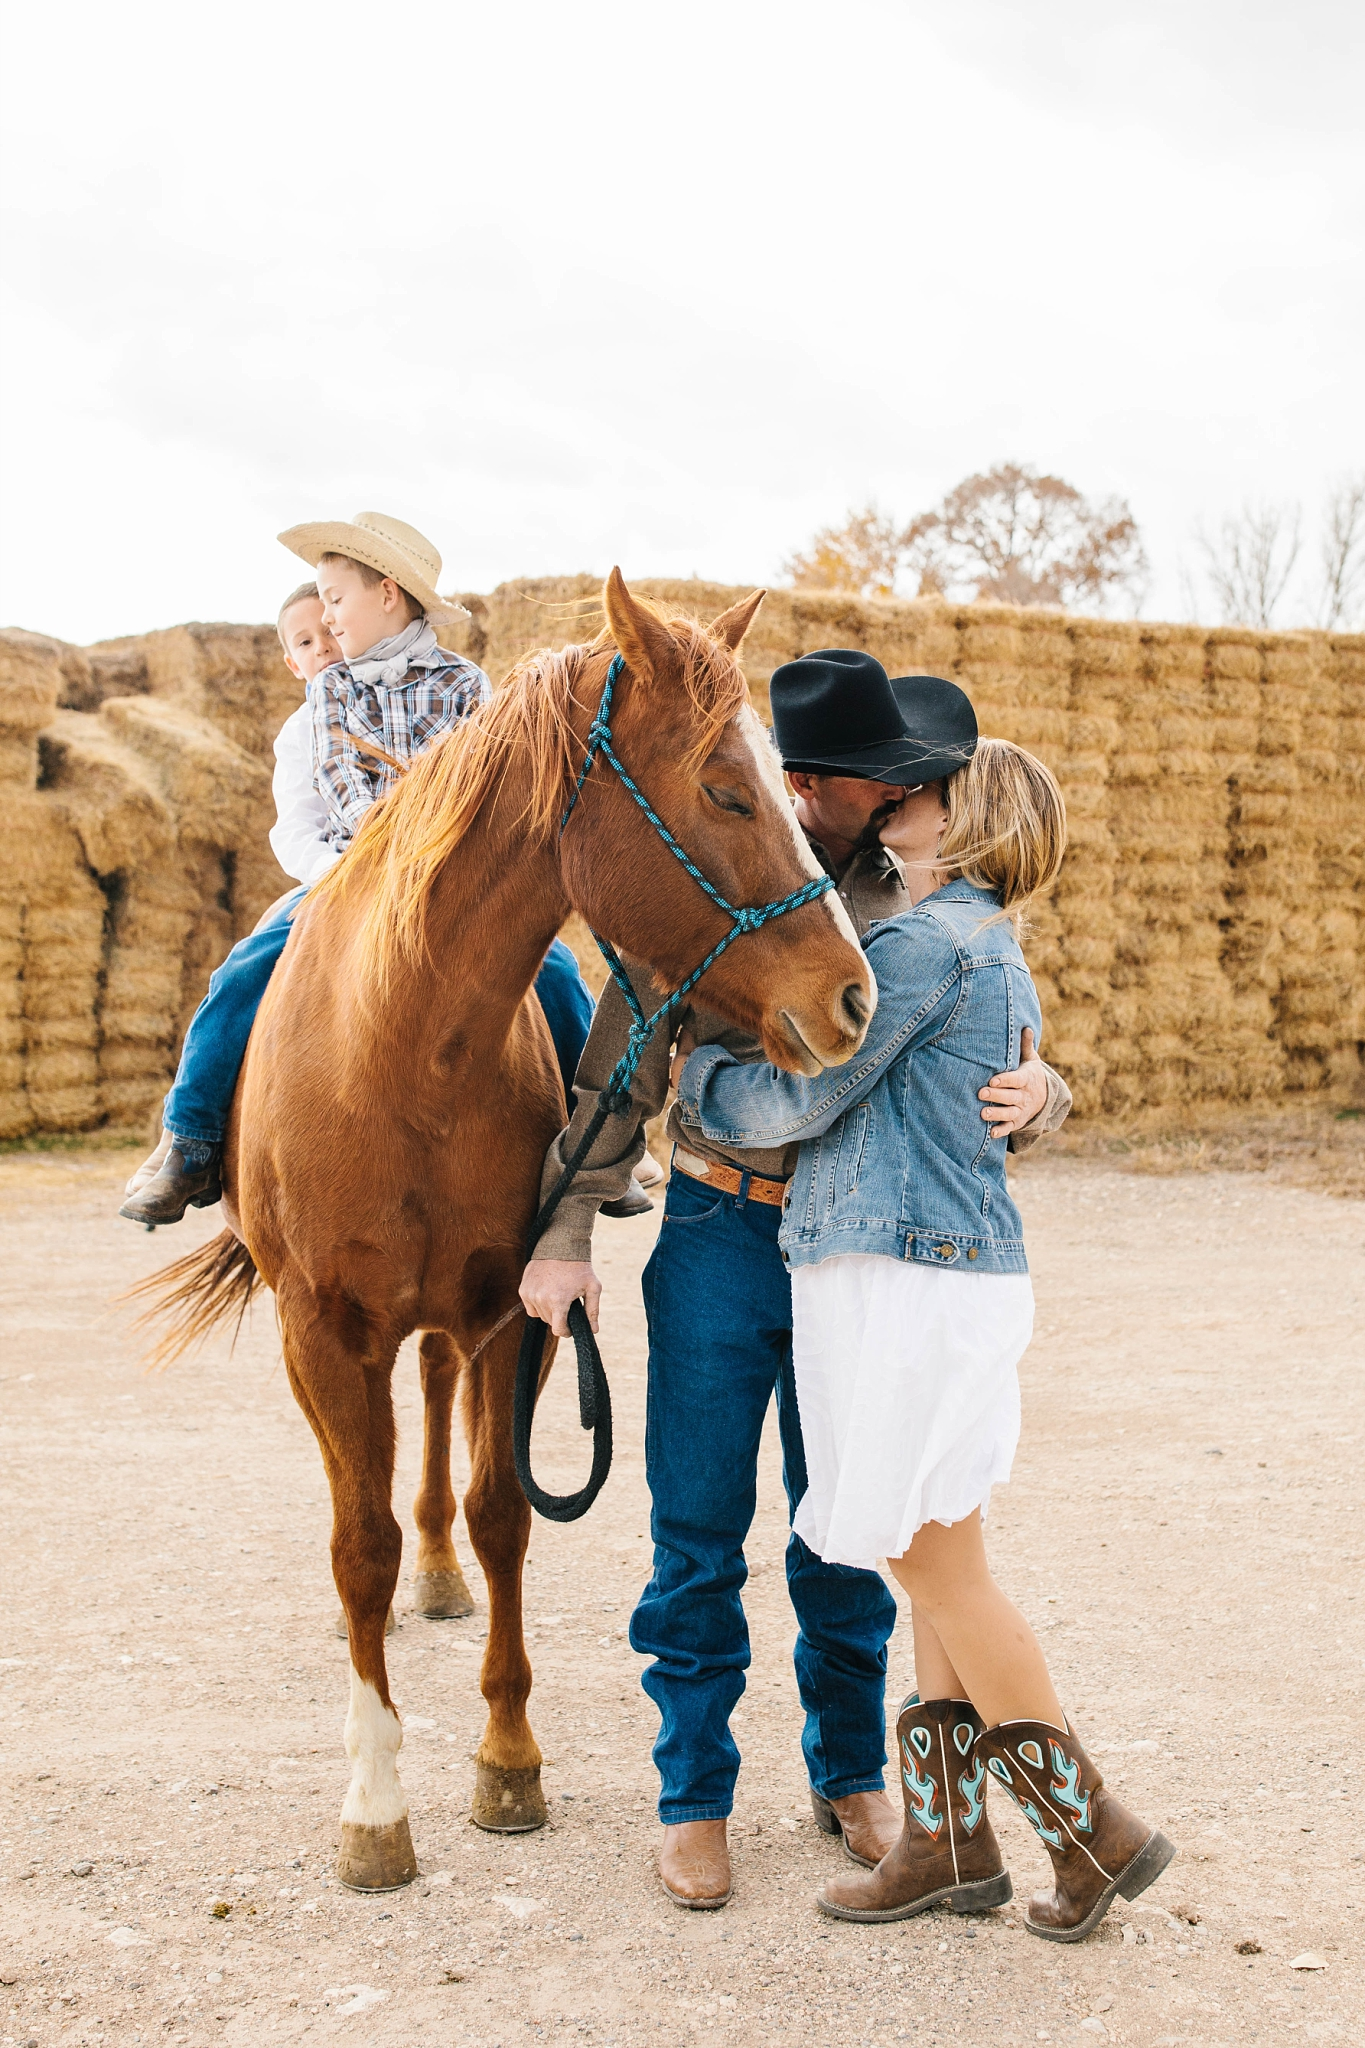 Lister-87_Lizzie-B-Imagery-Utah-Family-Photographer-Lifestyle-Photography-Salt-Lake-City-Park-City-Utah-County-Farm-Family-Session.jpg